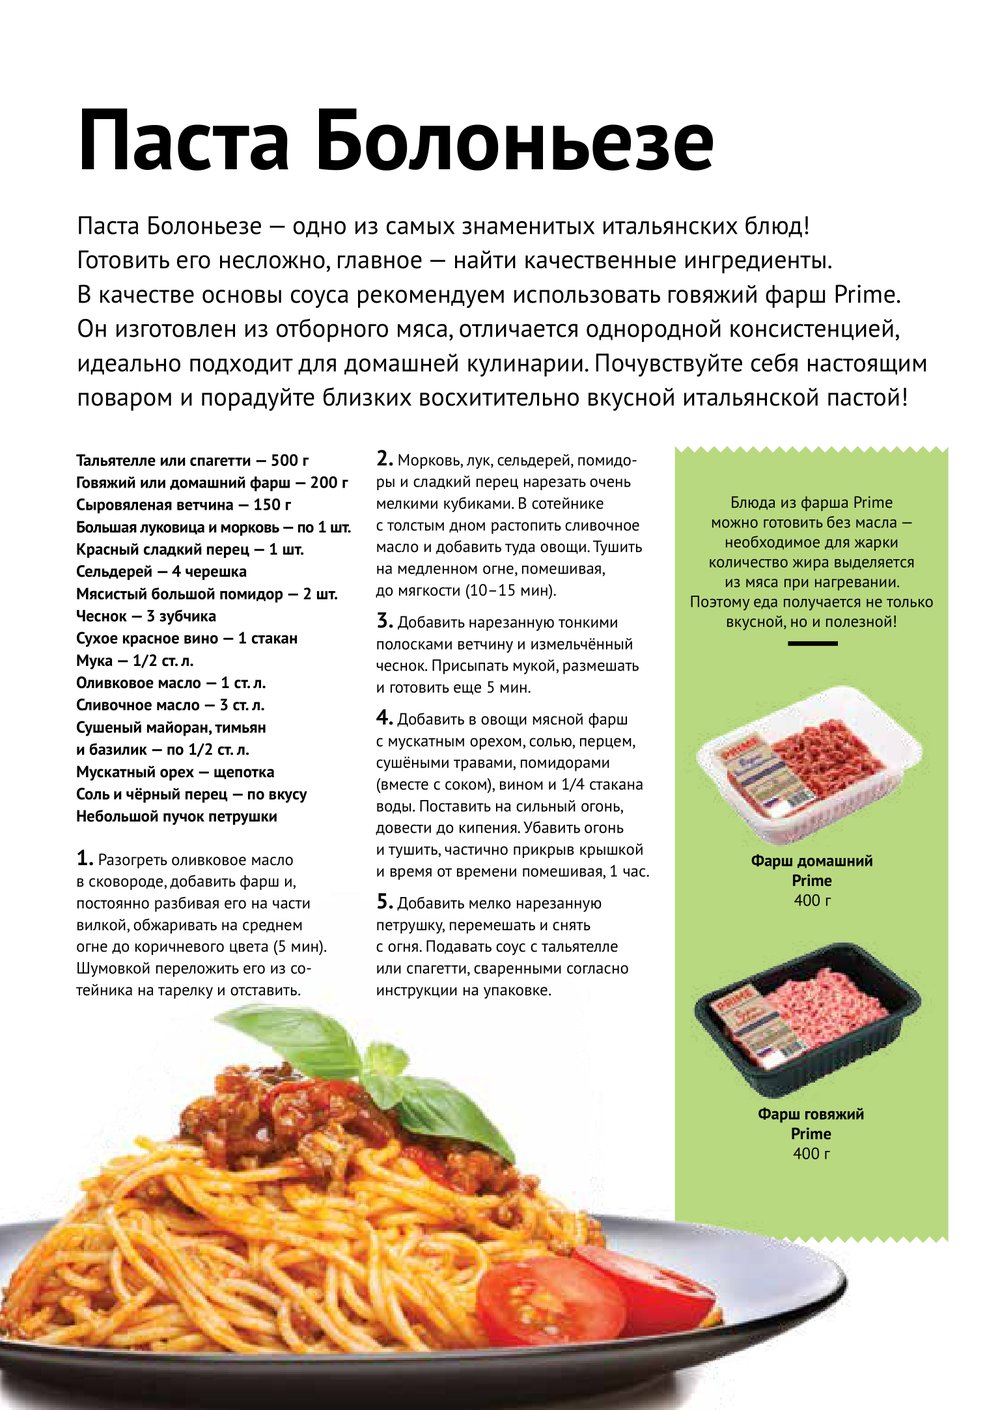 Каталог акций 7я семья с 13 по 26 сентября 2017 - стр. 2